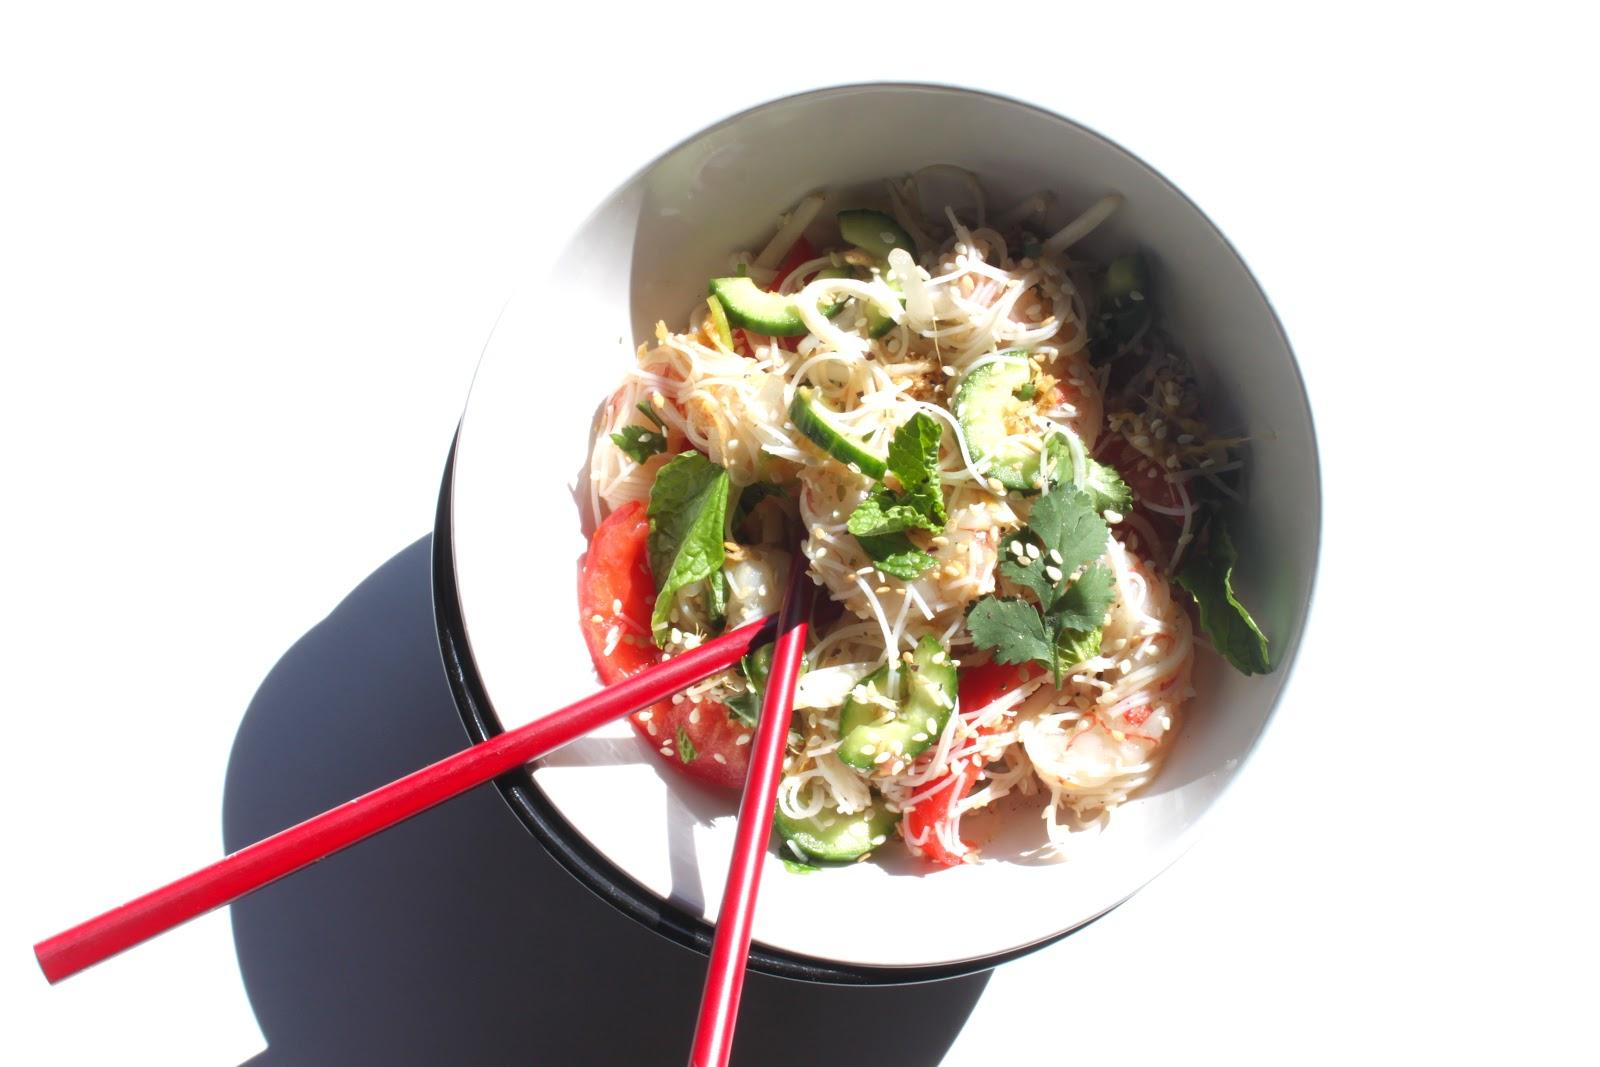 Petits repas entre amis salade tha aux crevettes for Petits repas entre amis